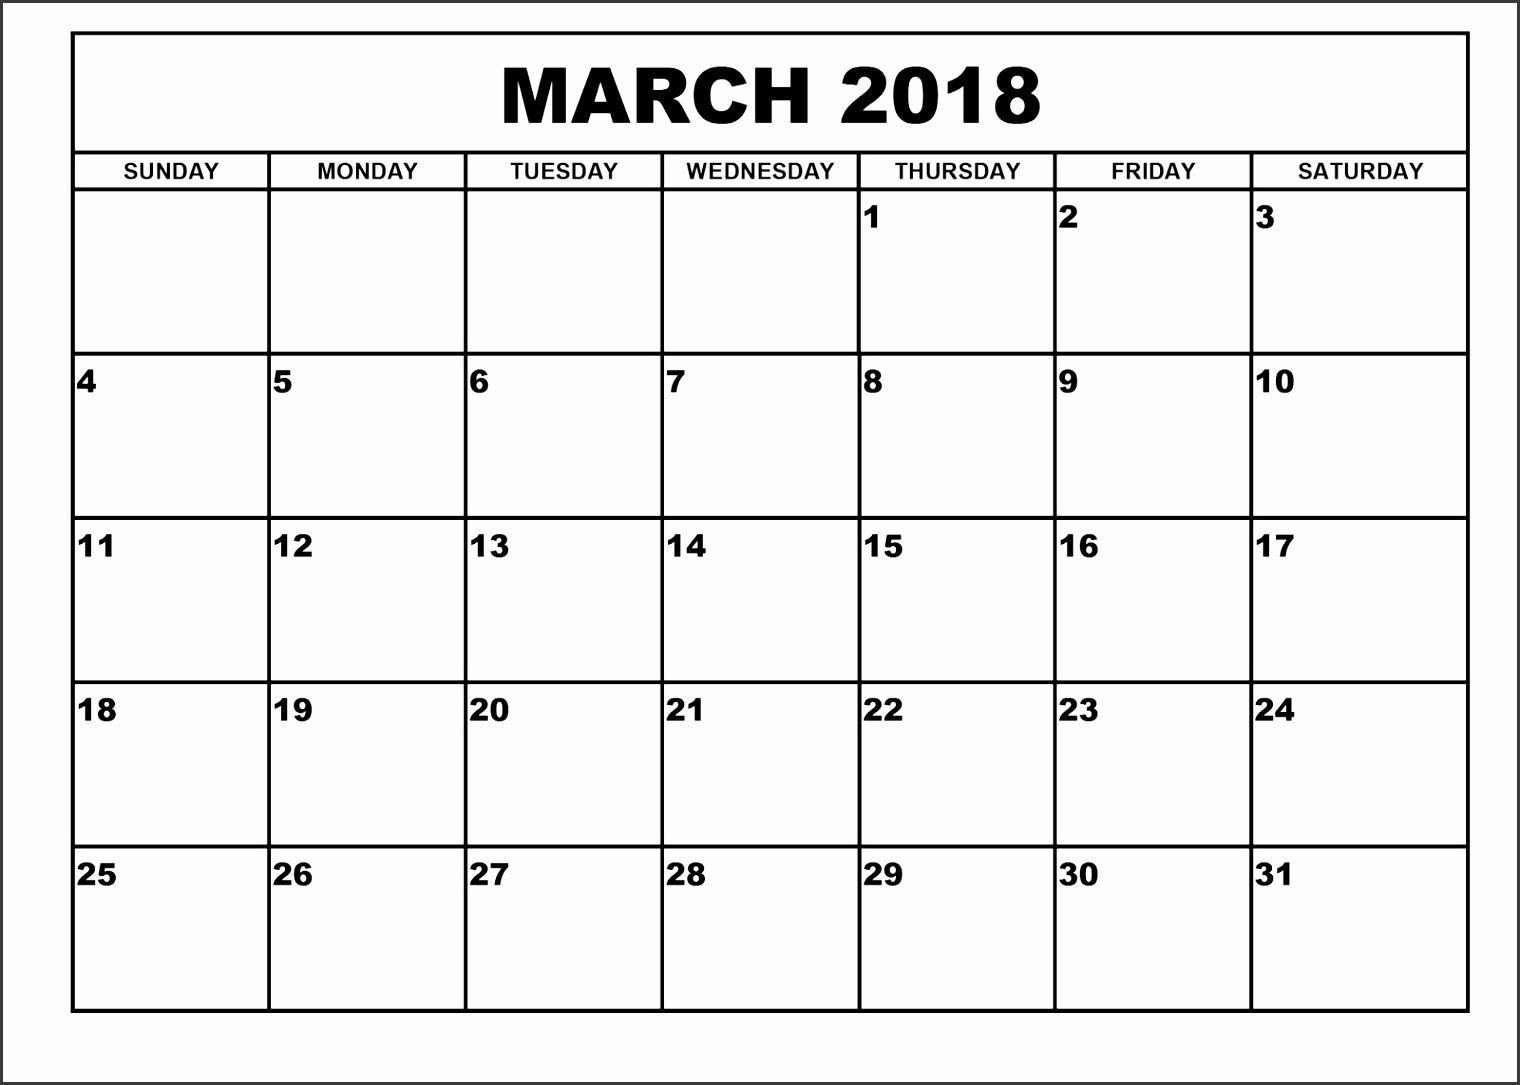 March 2018 Printable Calendar Templates throughout March 2018 Printable Calendar